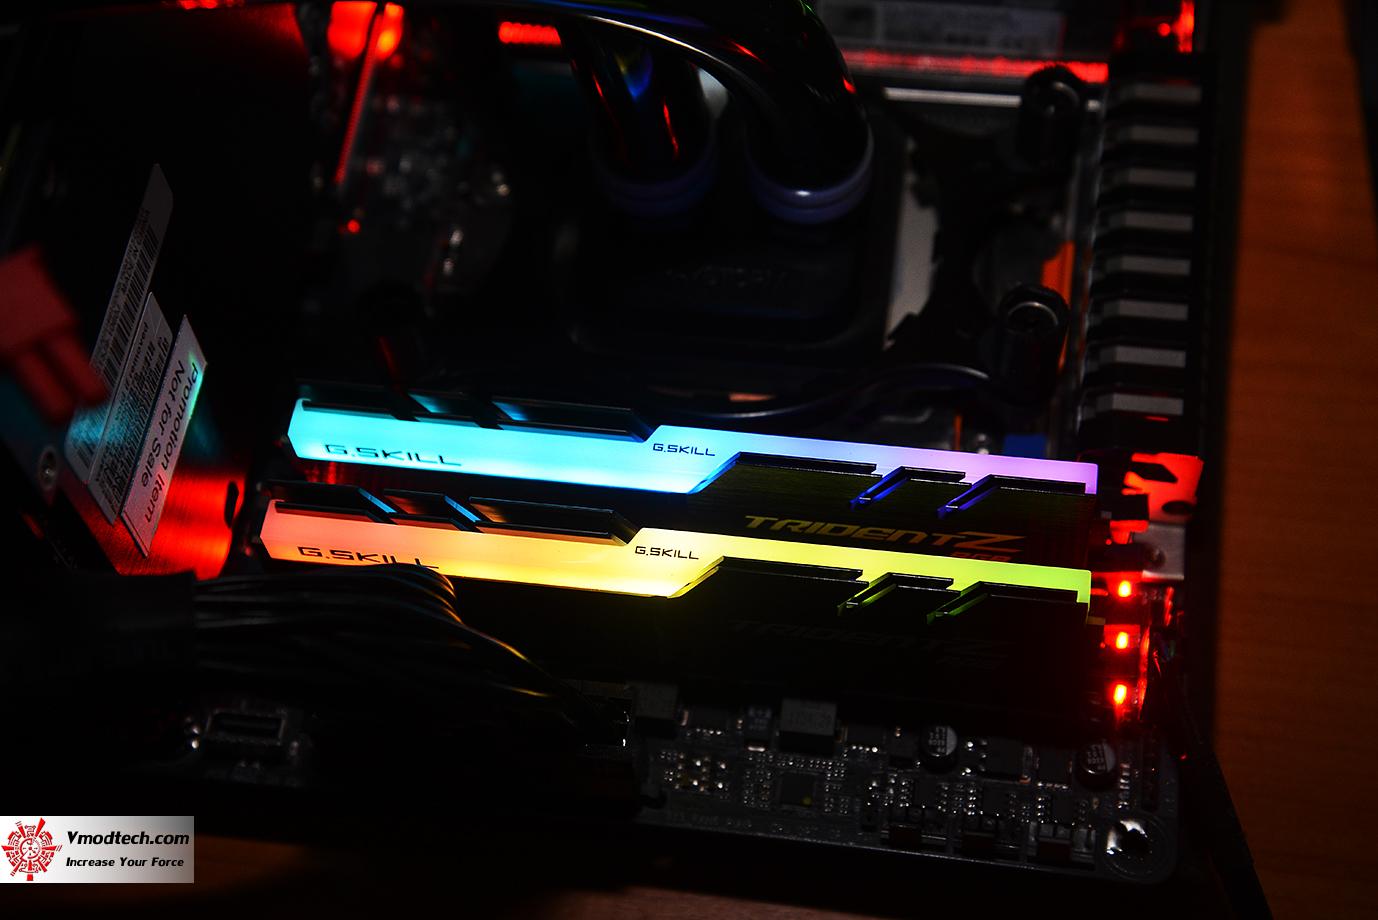 dsc 2991 G.SKILL Trident Z RGB DDR4 3200MHz 32GB (8GBx4) Quad Channel Review